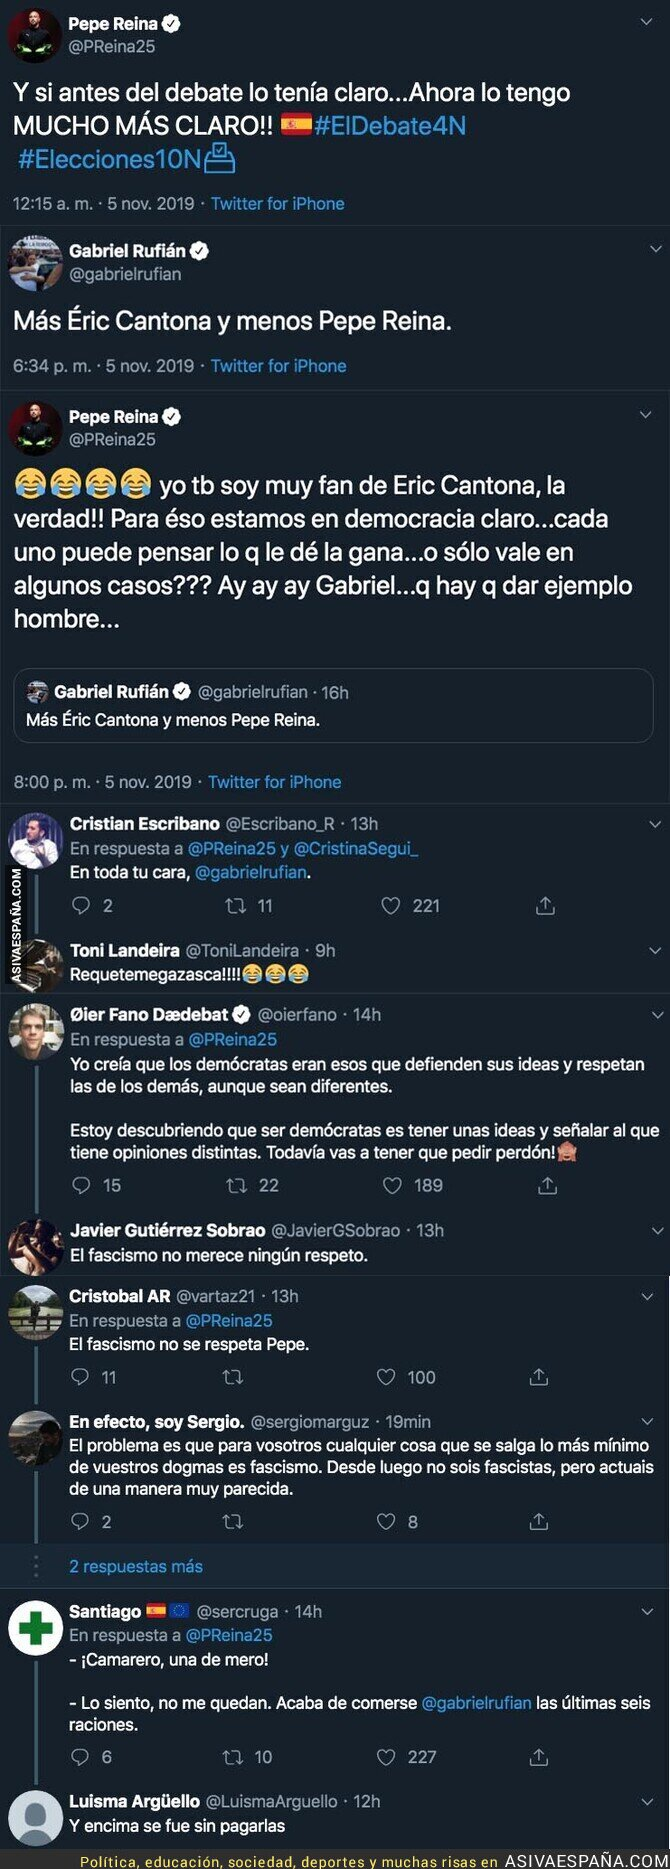 126298 - La brutal respuesta de Pepe Reina a Gabriel Rufián después de pedir